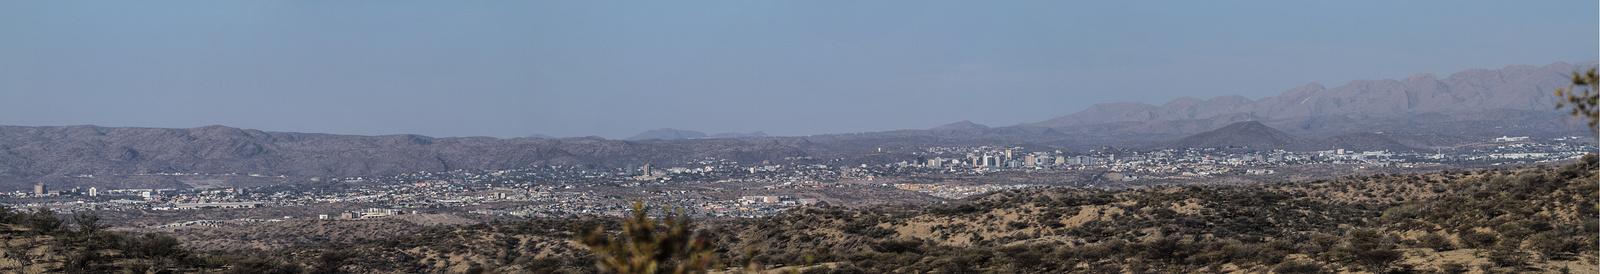 Windhoek.thumb.jpg.721bdc74d5de153a2395fe31b1635874.jpg